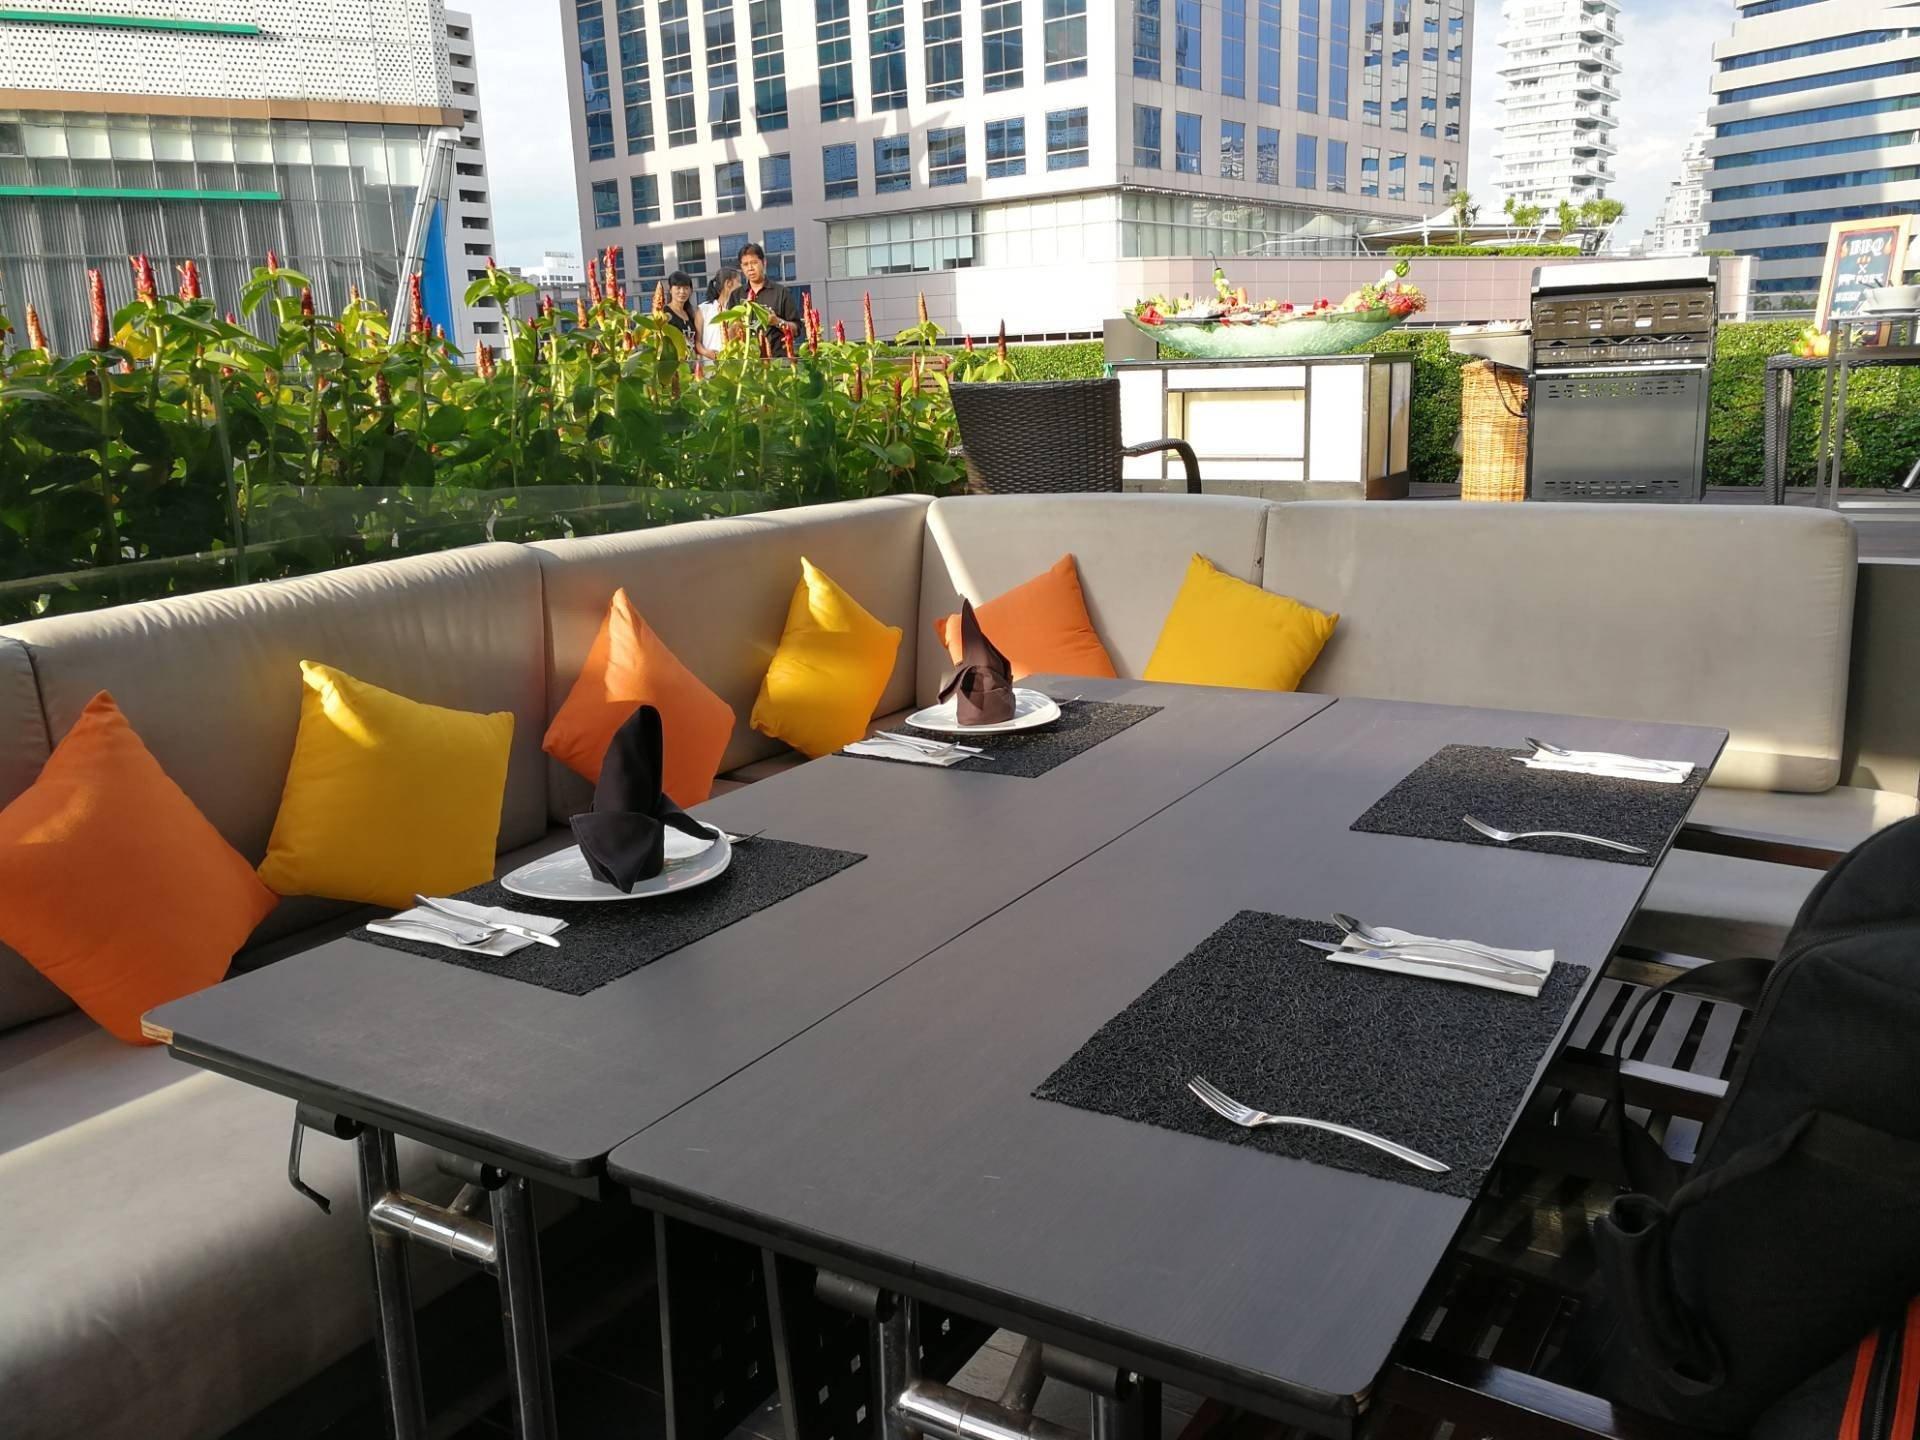 Zeta Cafe โรงแรมฮอลิเดย์อินน์ กรุงเทพฯ